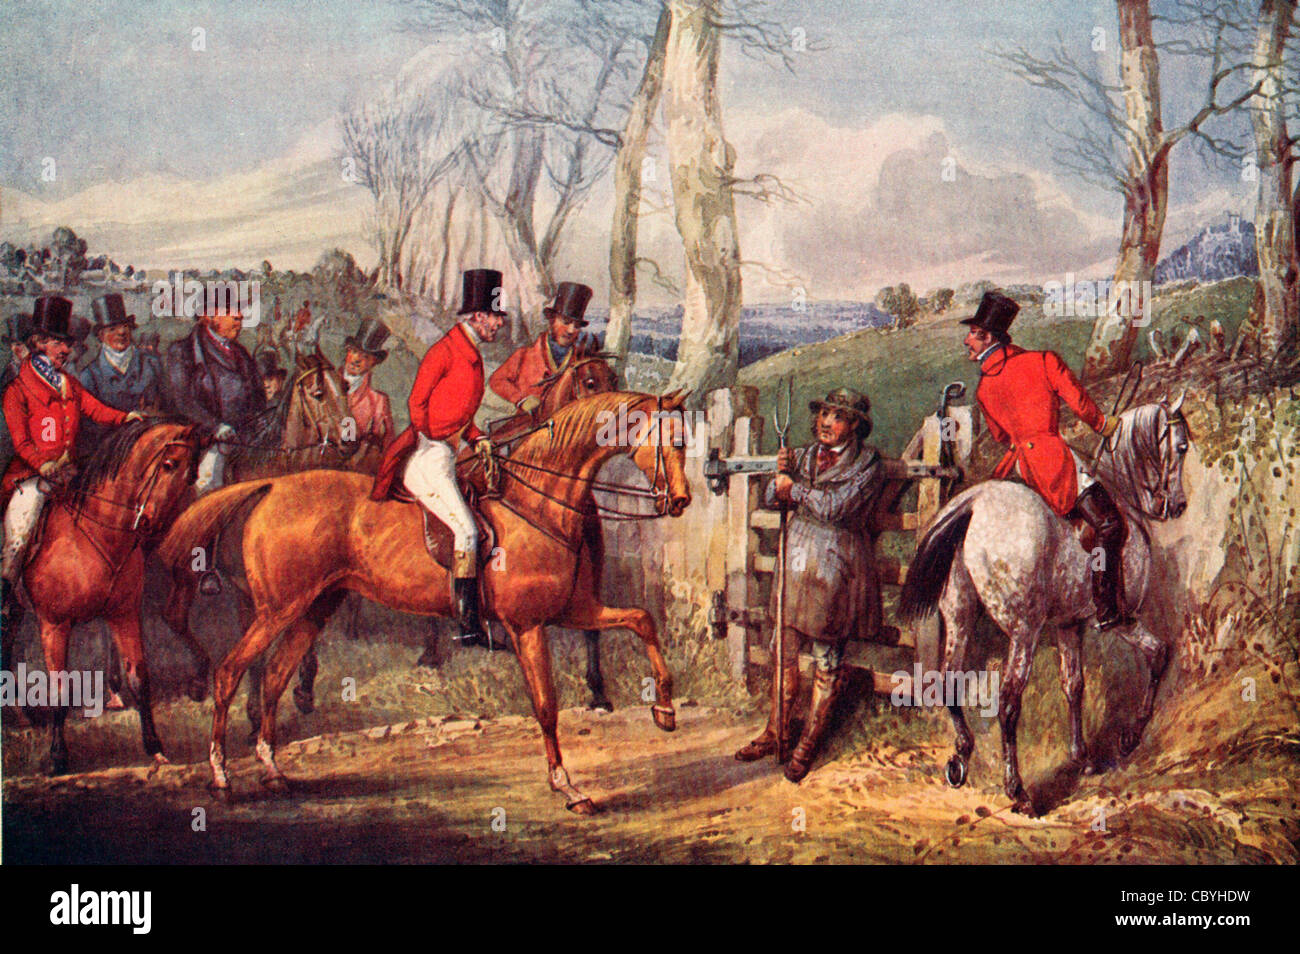 Duke of Wellington and Hodge - Stock Image